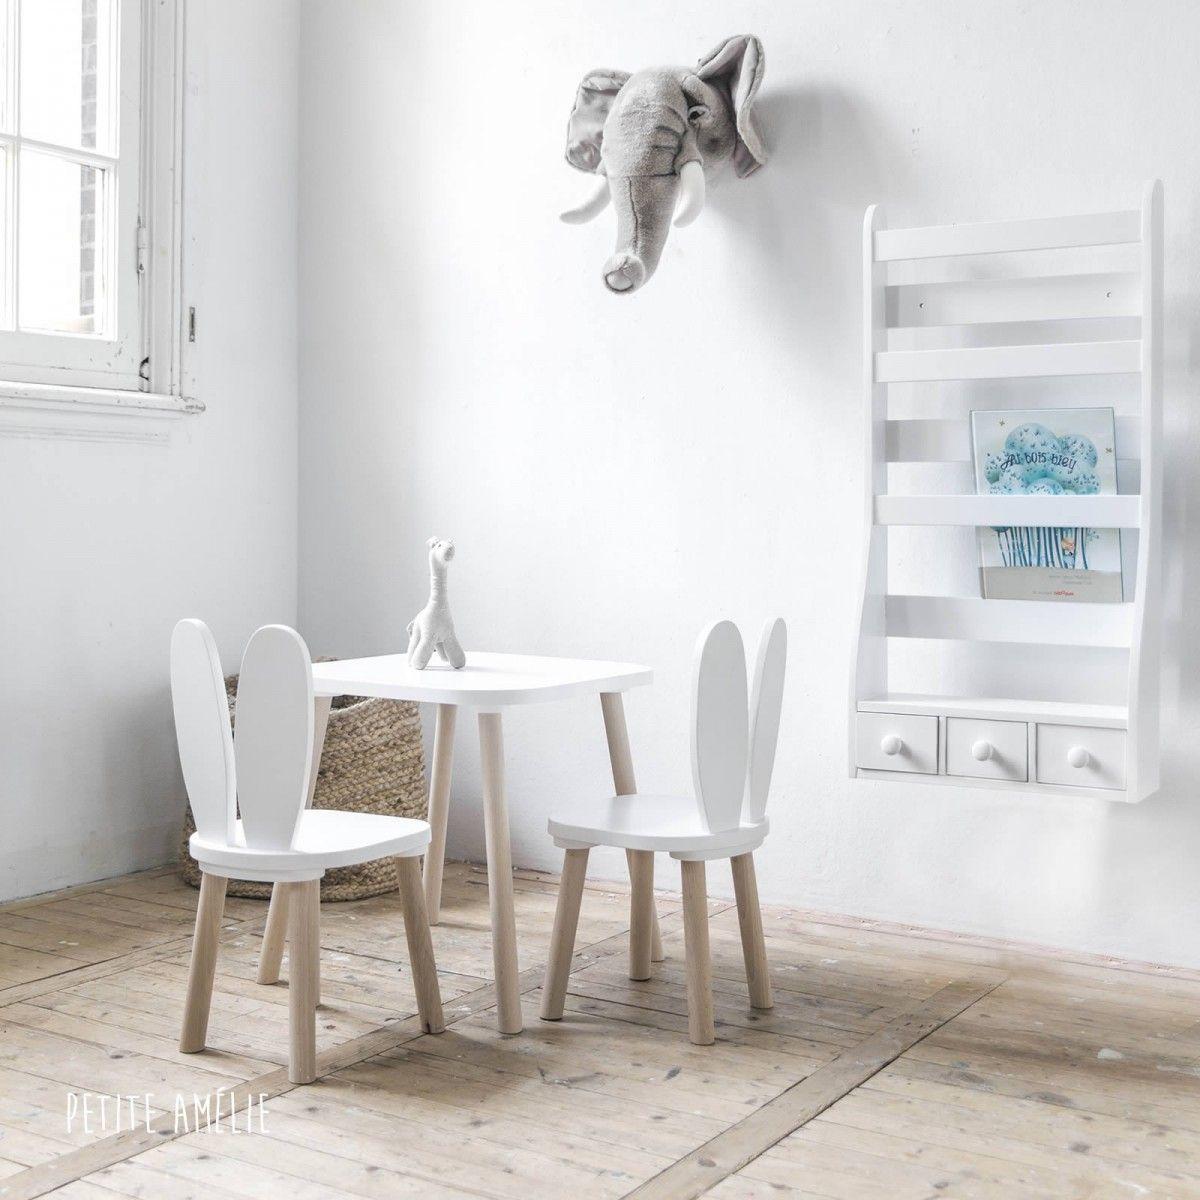 Kinderstoeltje Met Konijnenoren En Tafeltje In De Kleur Wit